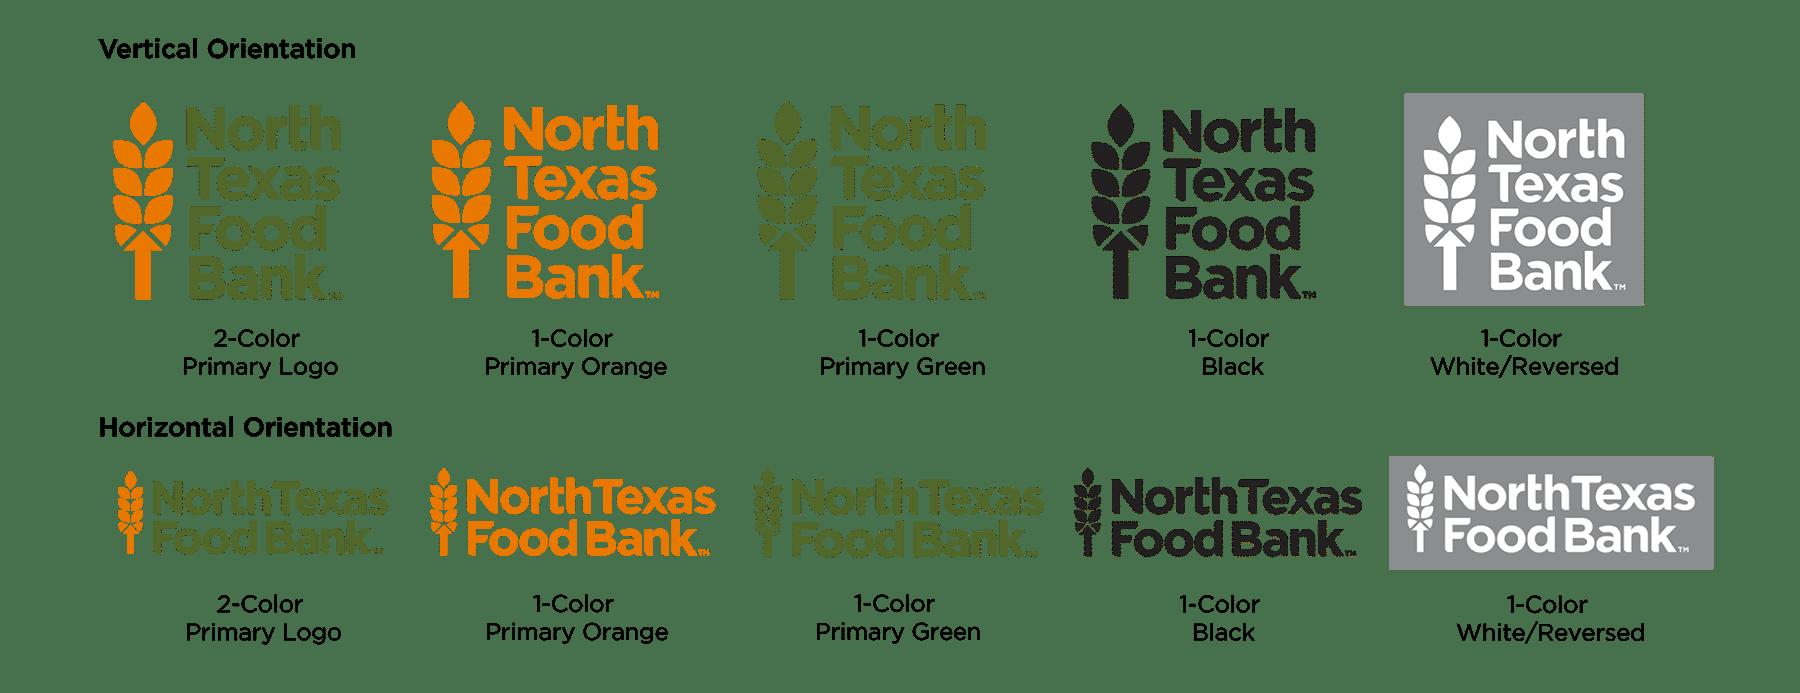 NTFB Alternate Logo Versions